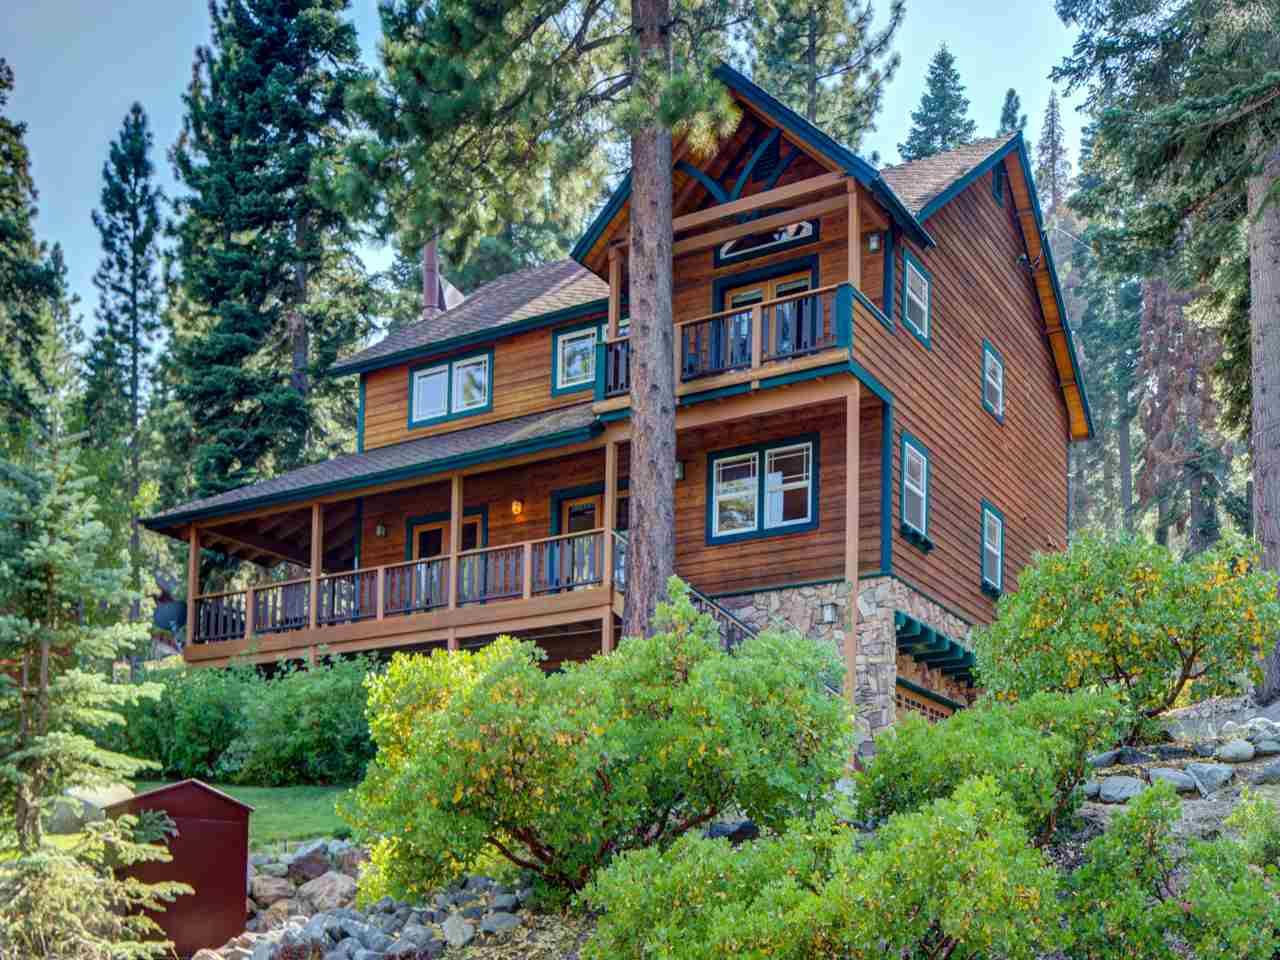 Image for 9048 Scenic Drive, Meeks Bay, CA 96142